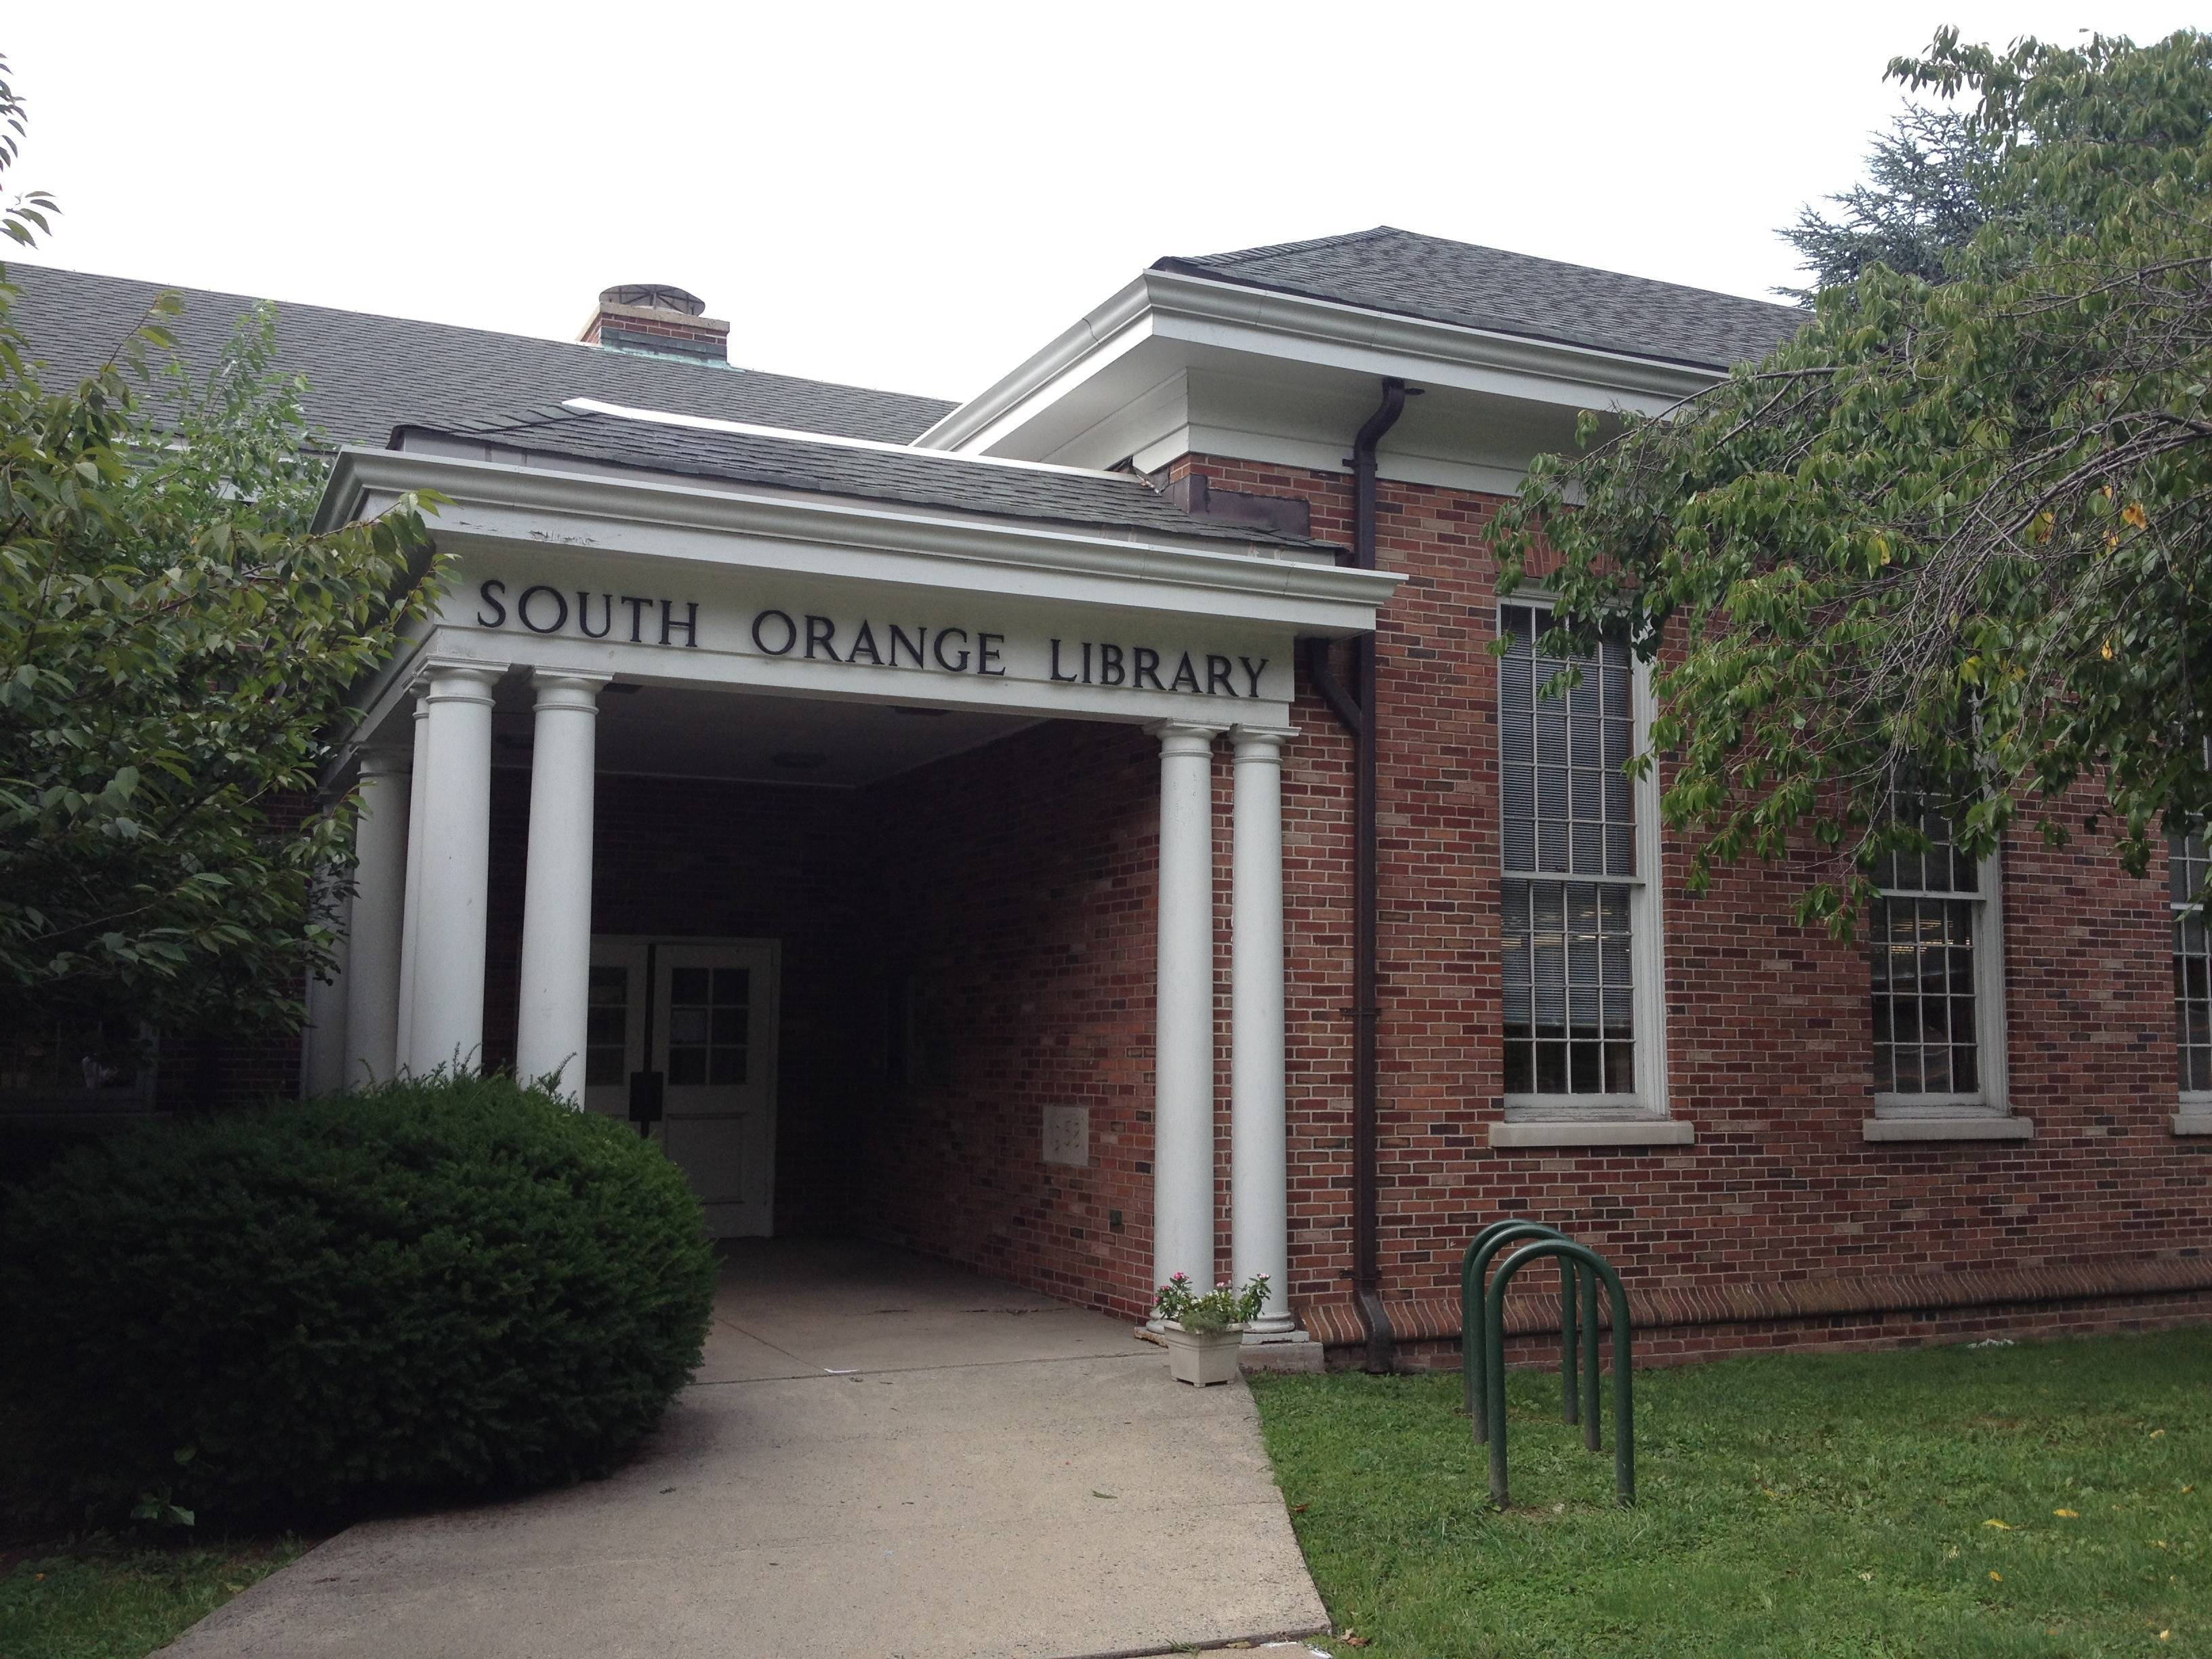 2b69103b14faef3aa2ef_South_Orange_Library.JPG